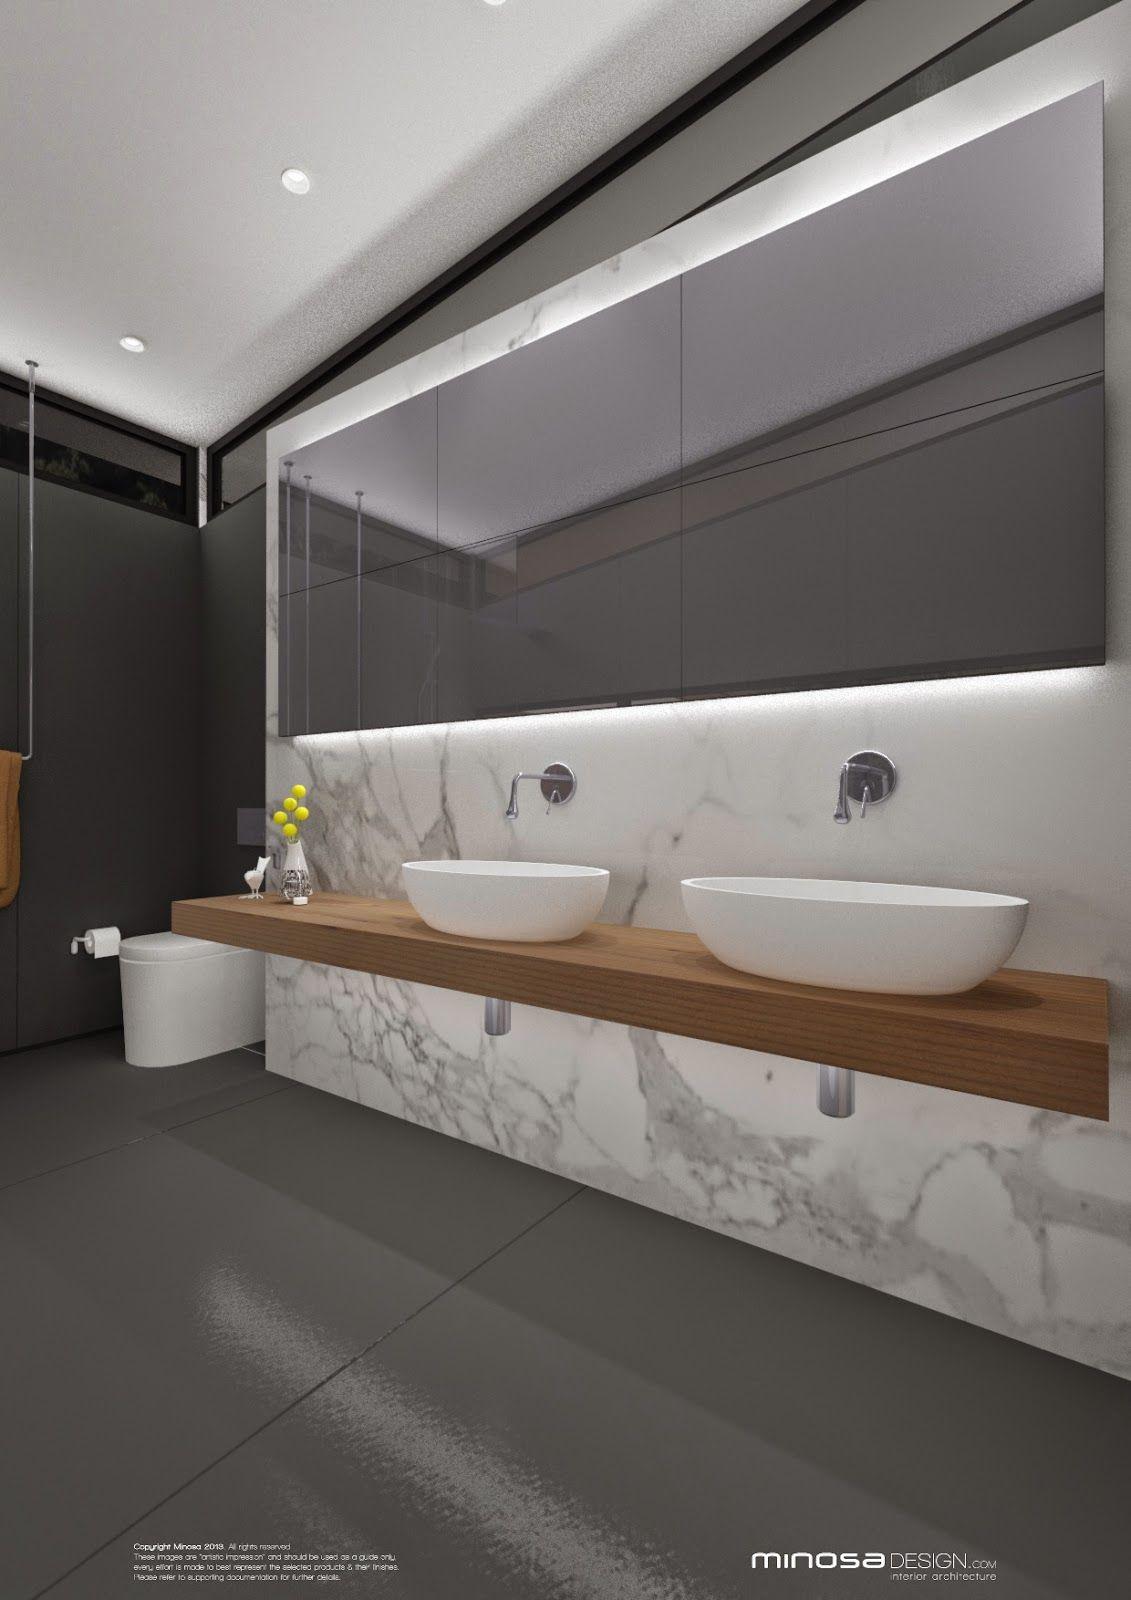 Design von badezimmer minosa design bathroom with a view  bathing with nature  bad